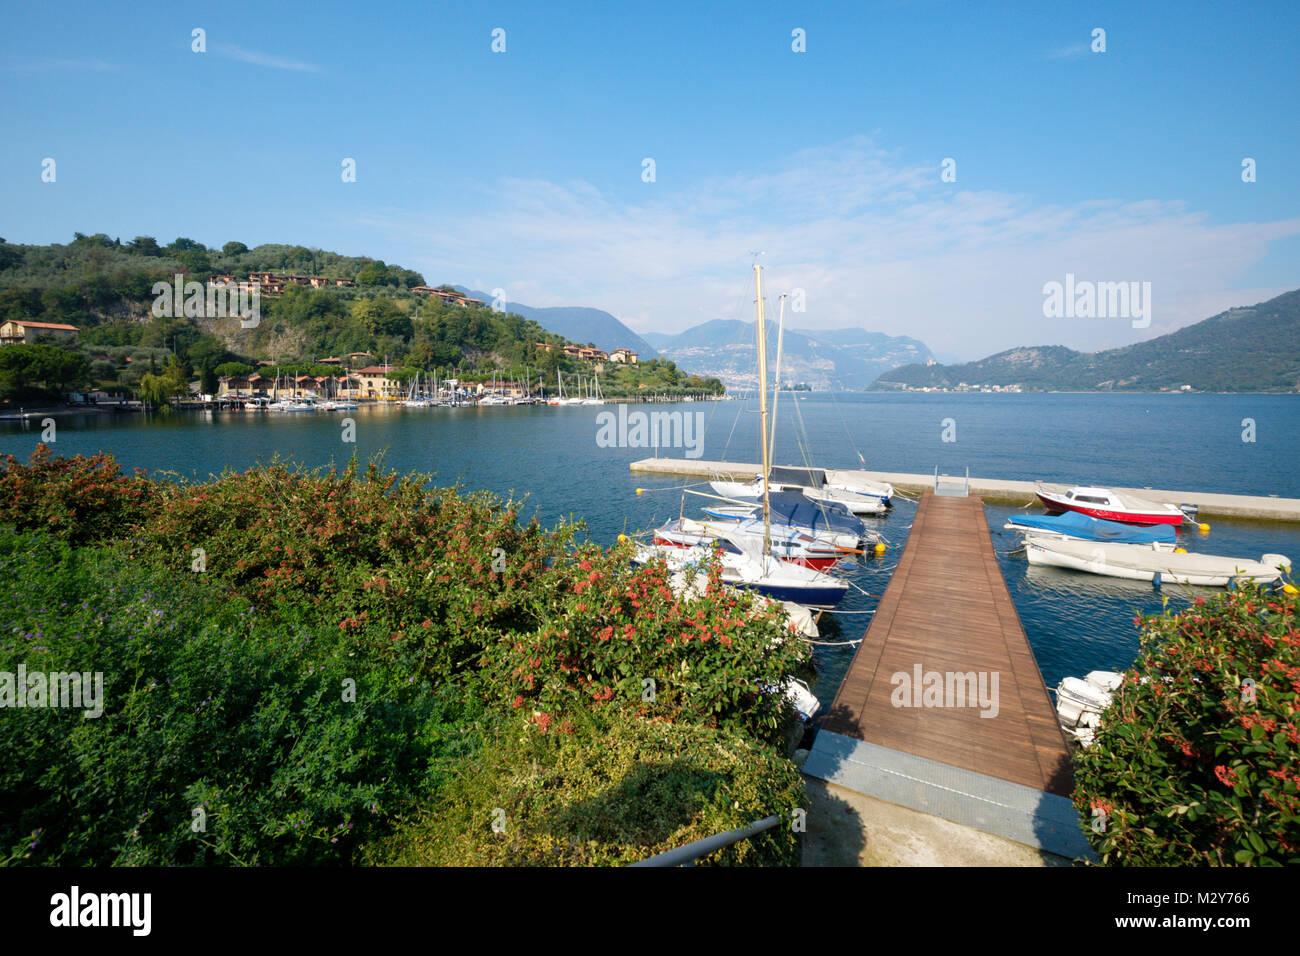 Lake Iseo (Lago d'Iseo) from Sulzano, Lombardy, Italy - Stock Image